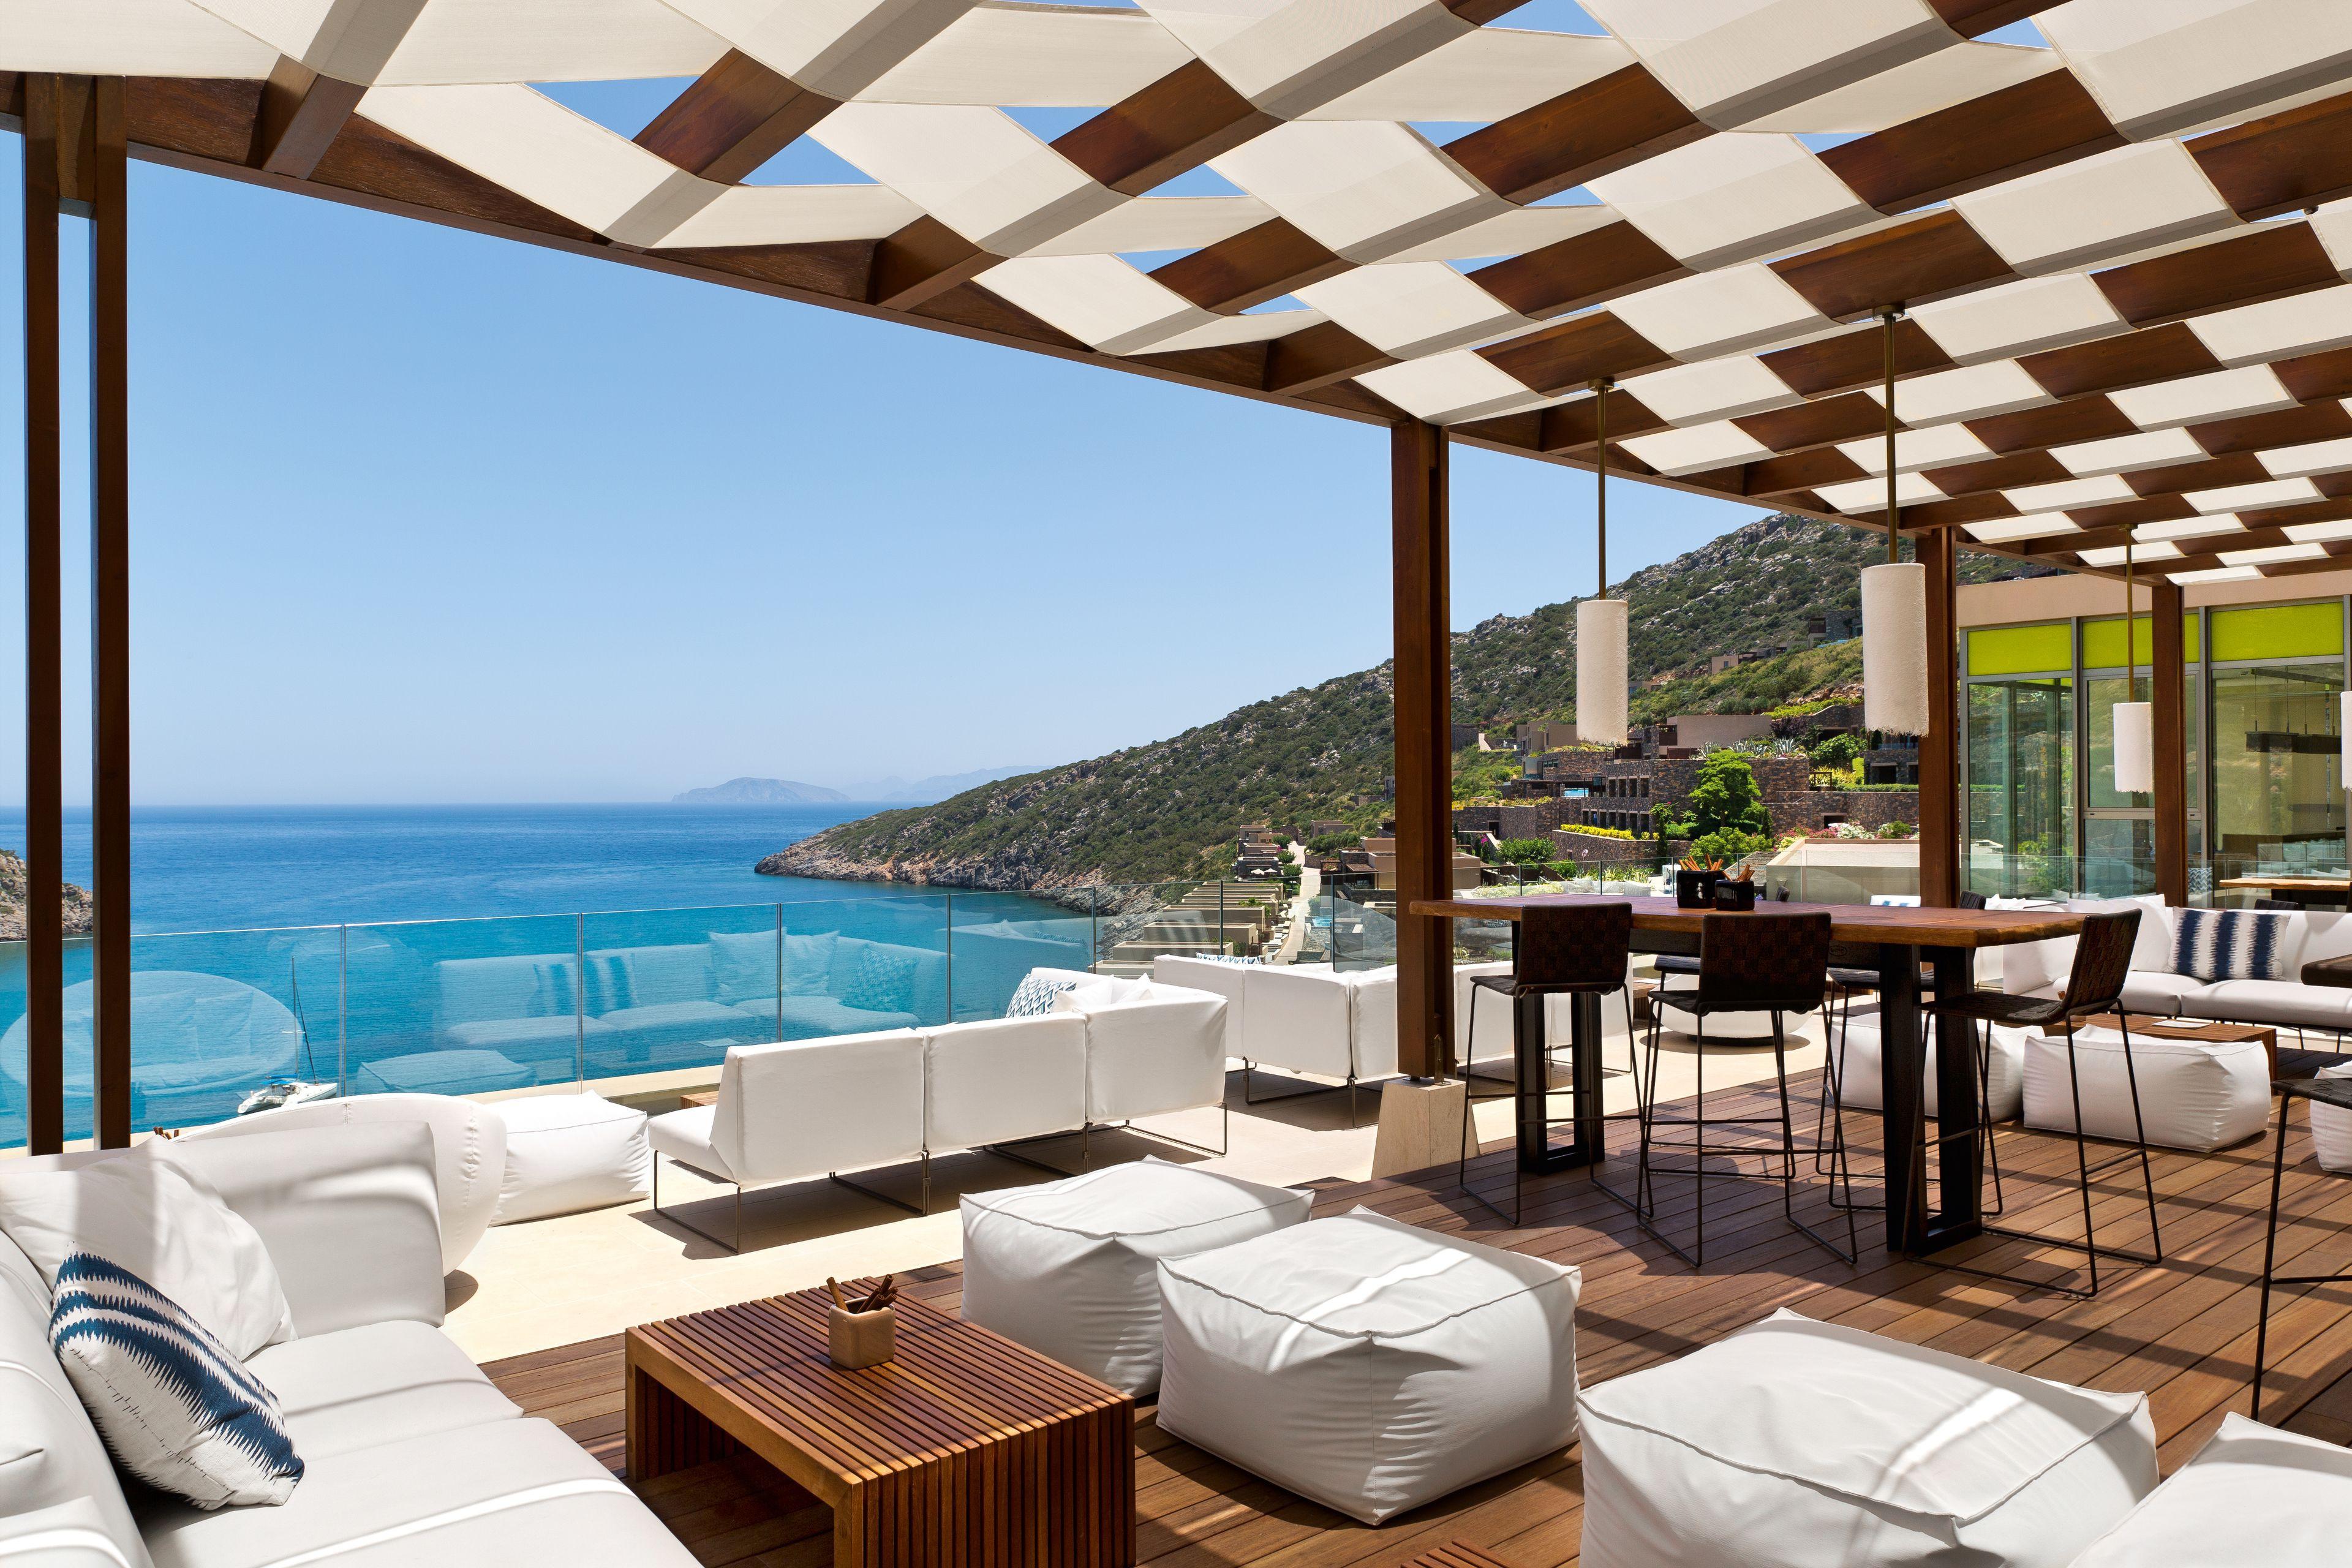 Courtesy of Daios Cove Luxury Resort and Villas / Expedia